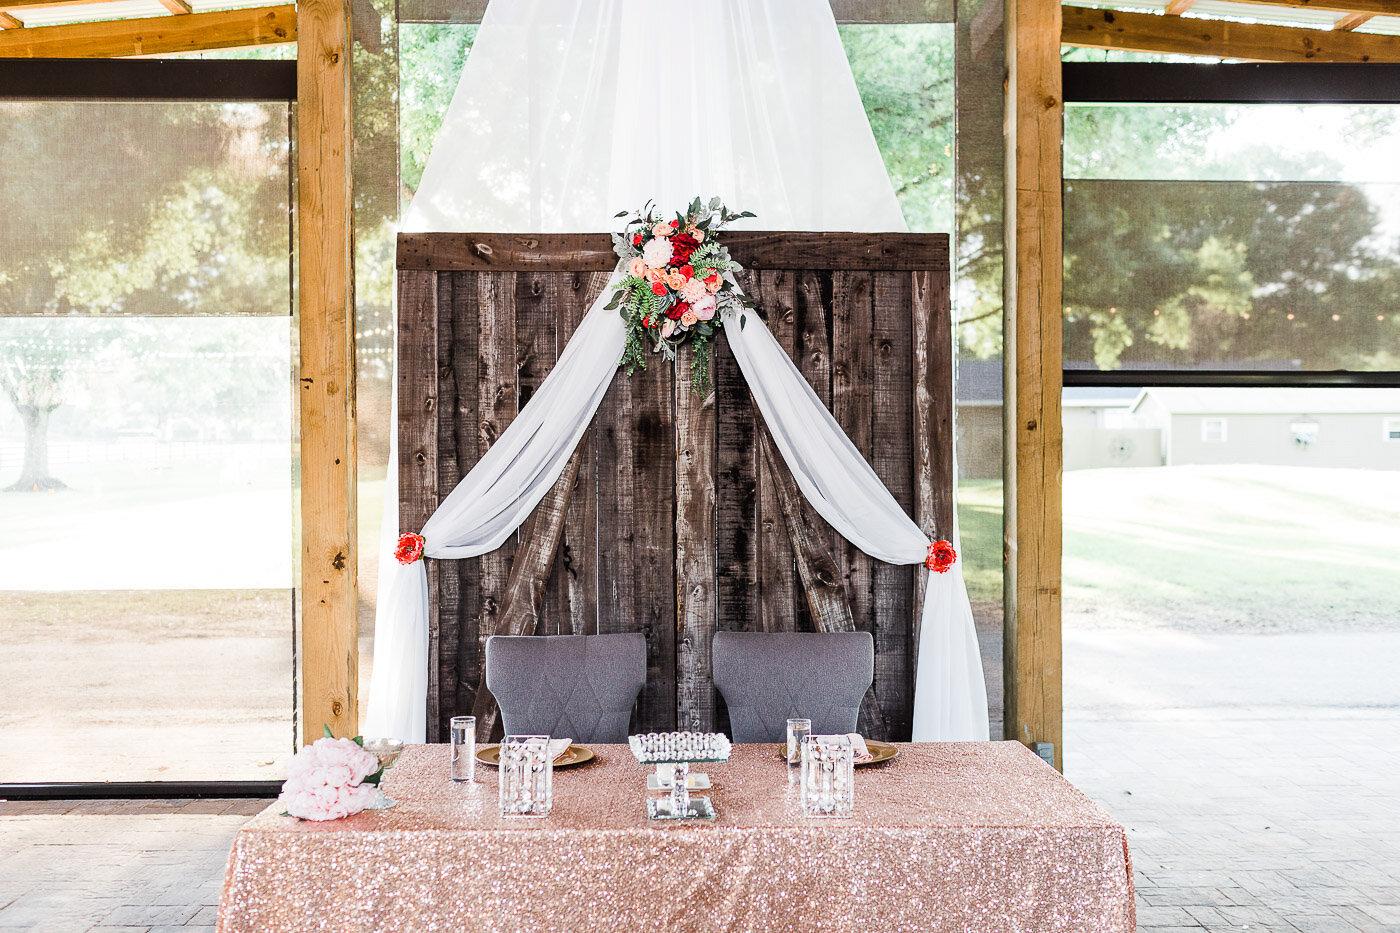 Lakeland-barn-wedding-at-white-horse-ranch-76.jpg